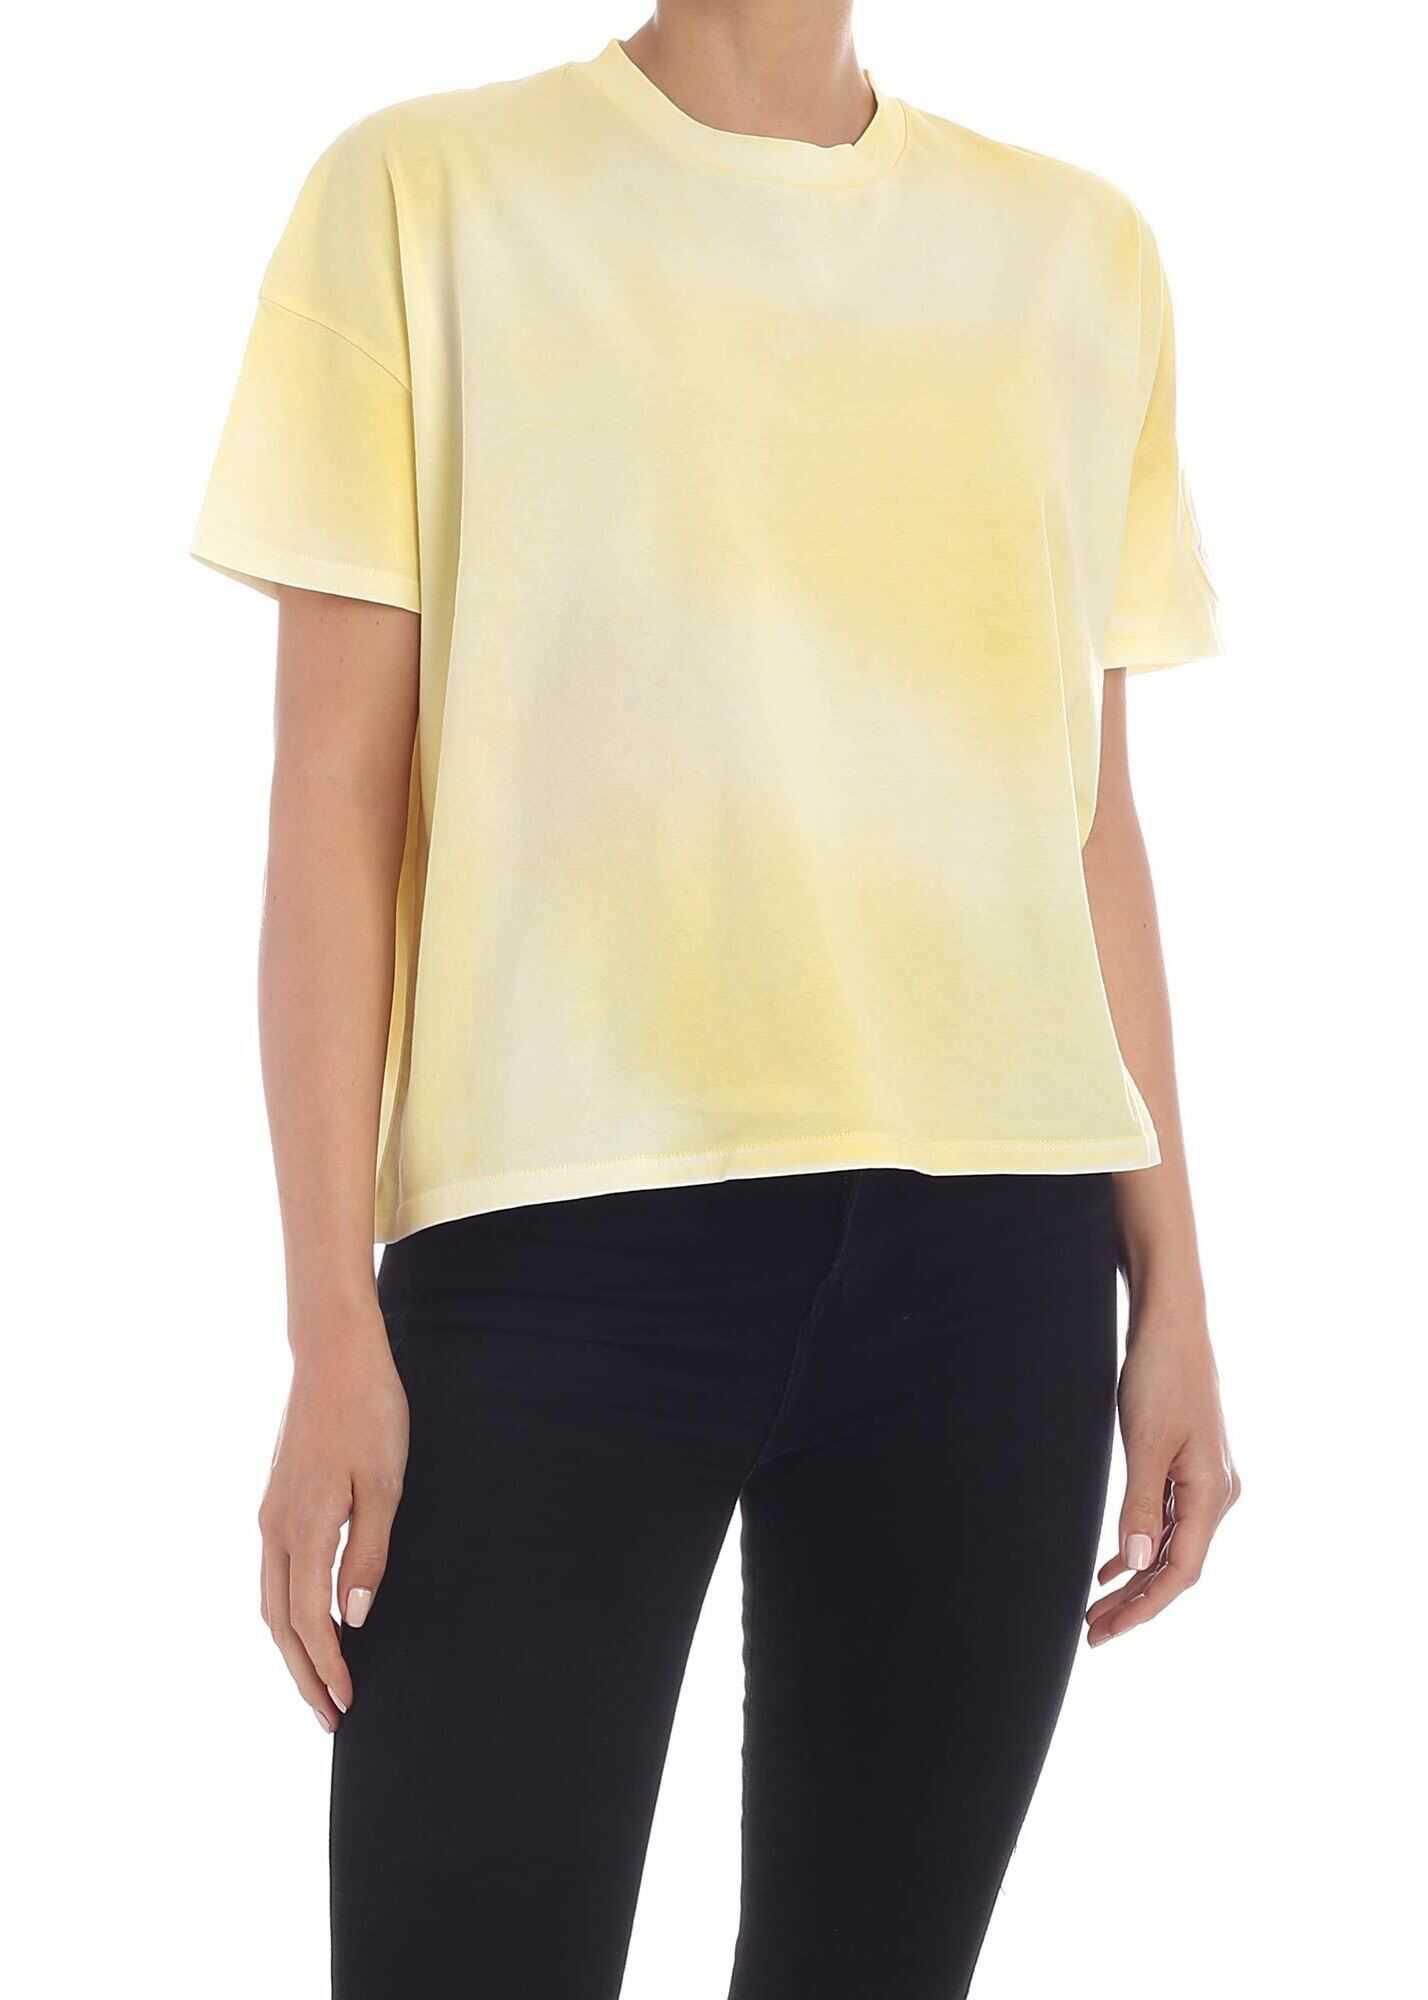 Moncler Logo T-Shirt In Faded Yellow Yellow